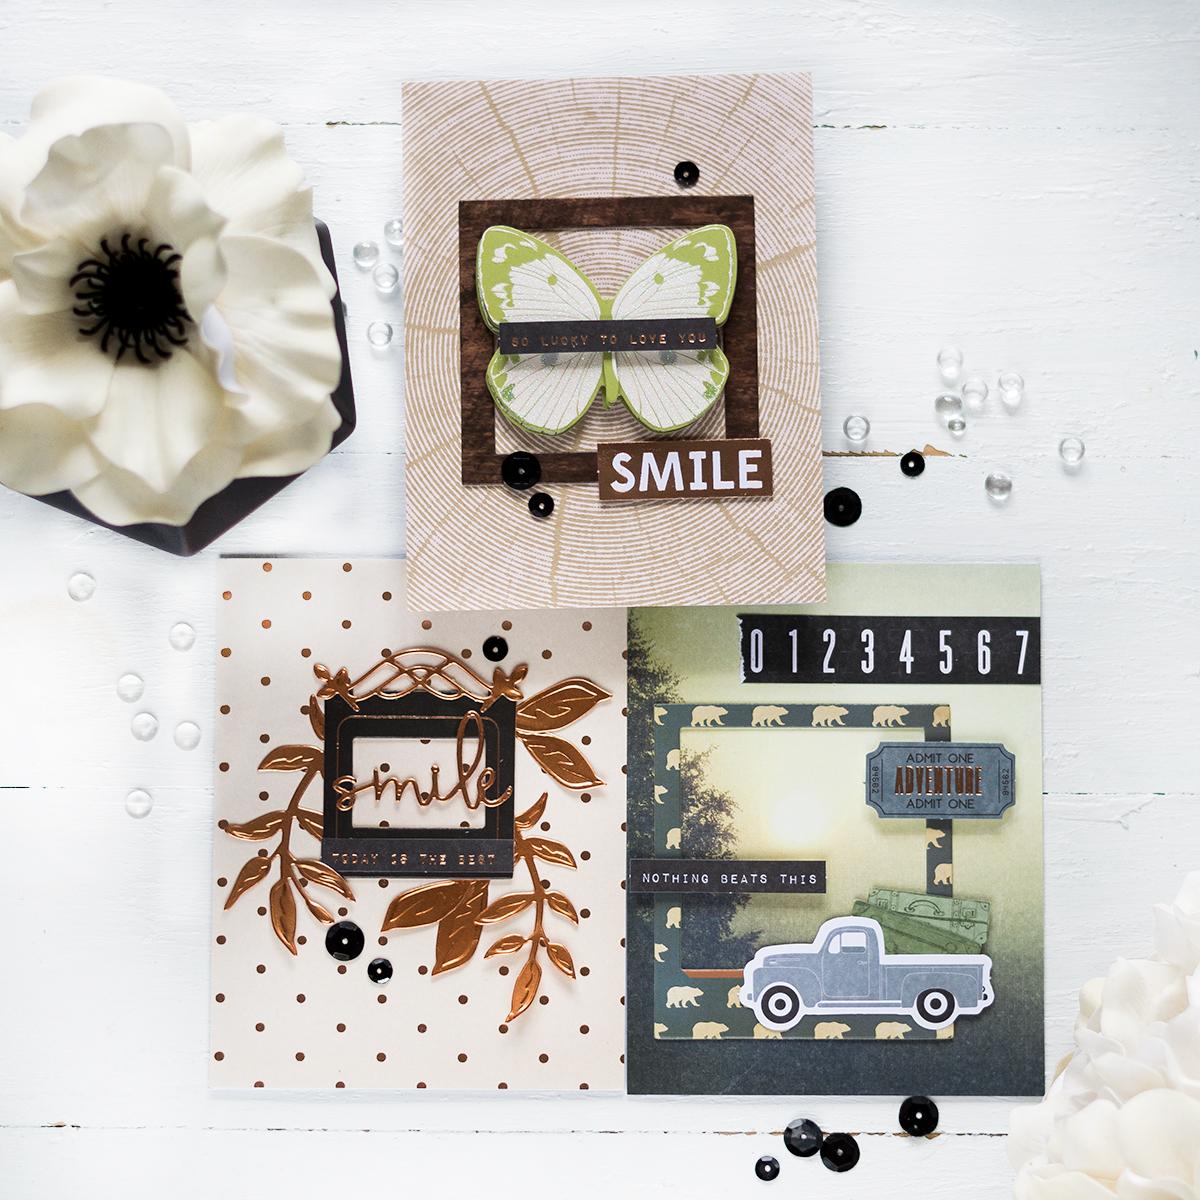 Spellbinders May Card Kit. Card by Svitlana Shayevich